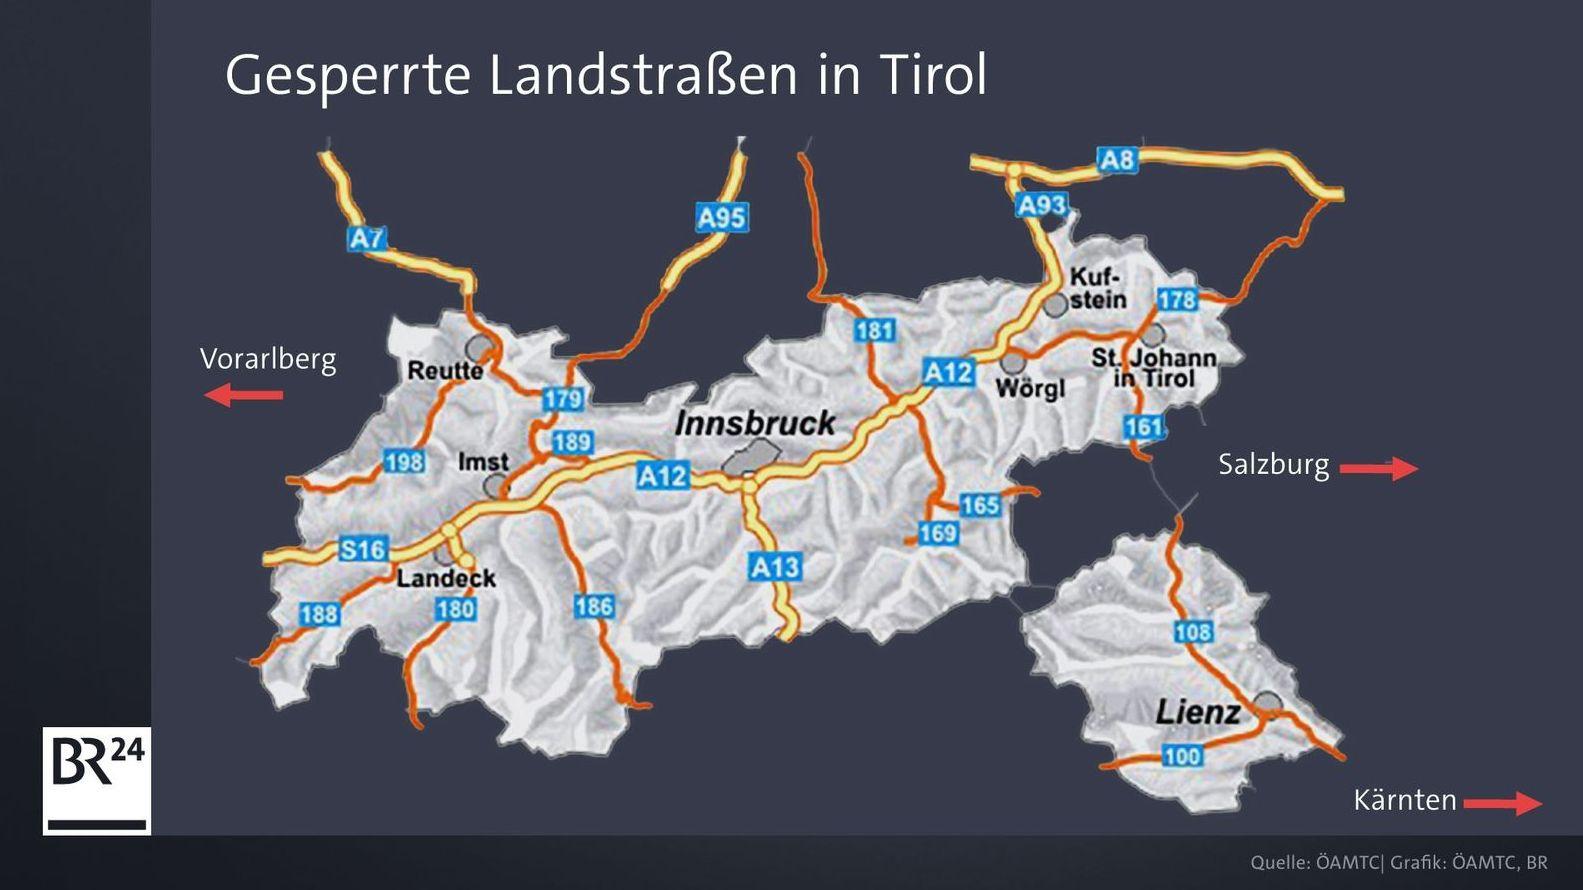 Gesperrte Landstraßen in Tirol